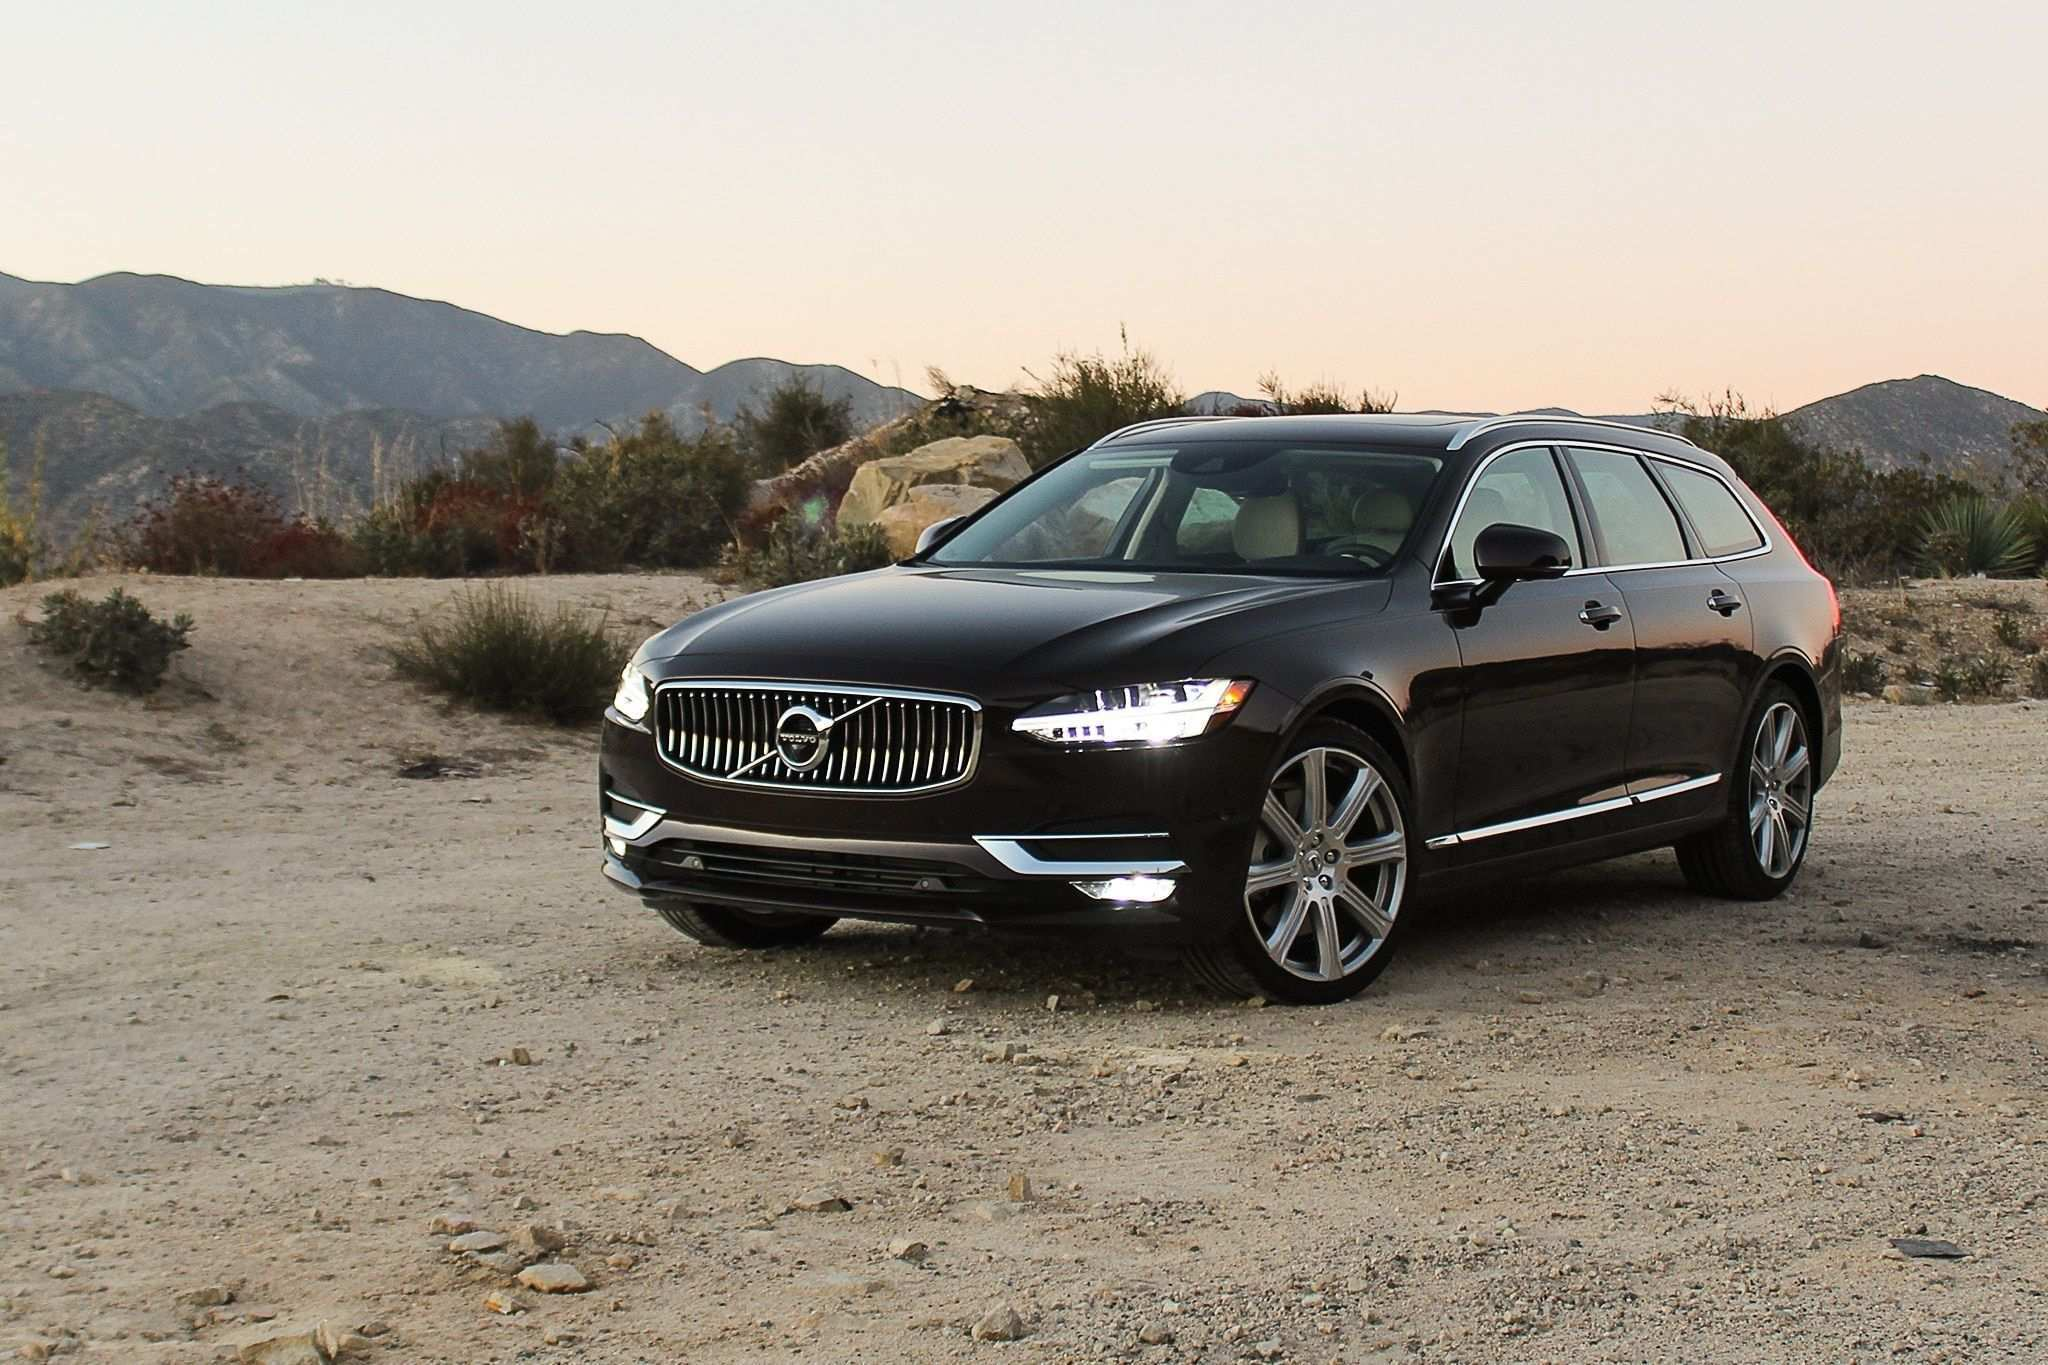 93 All New 2020 Volvo V90 Specification Style for 2020 Volvo V90 Specification